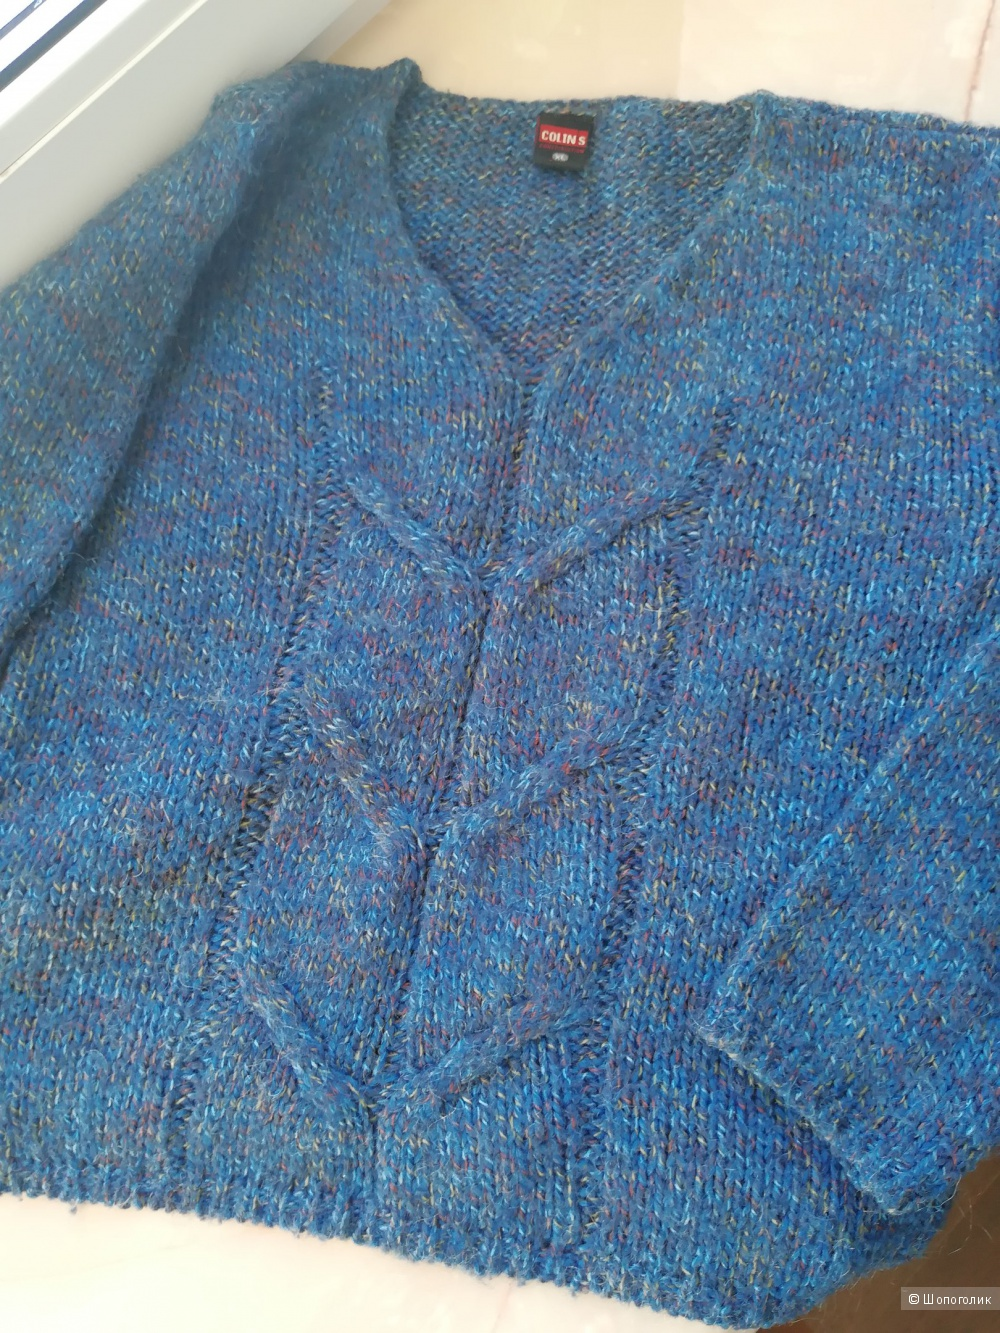 Colin's шерстяной свитер - джемпер  размер 46-48